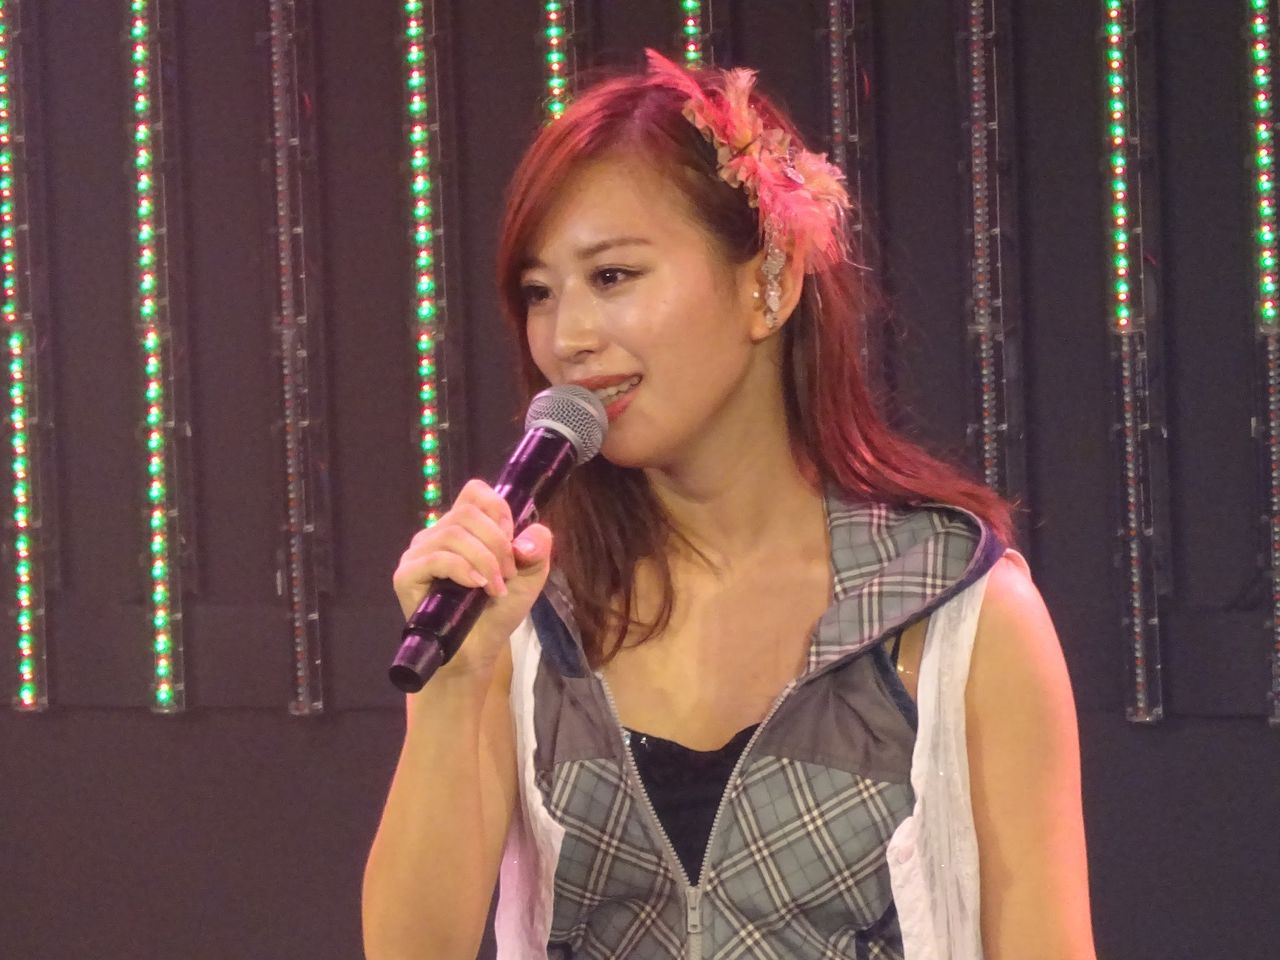 NMB48木下春奈、卒業を発表。卒業時期は未定